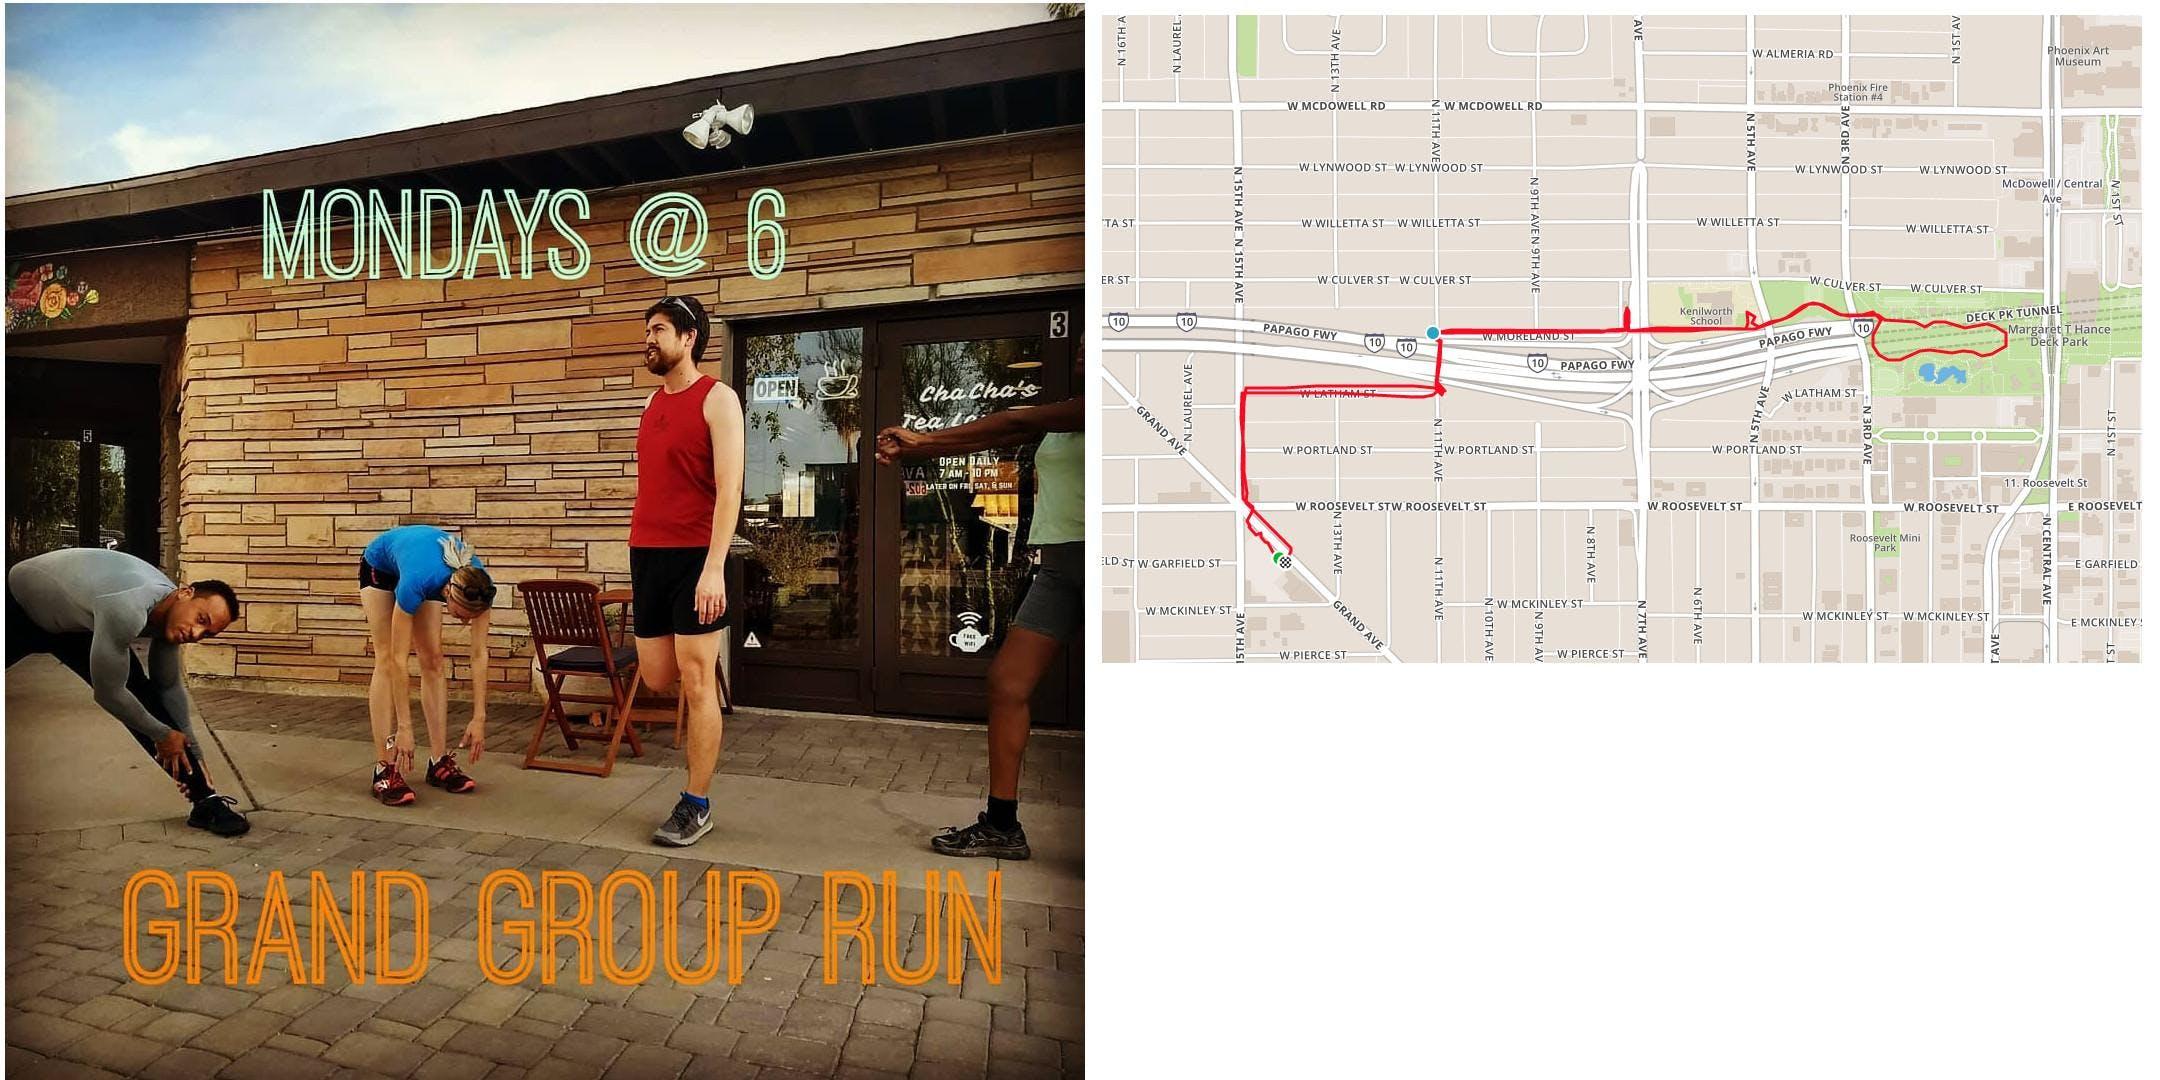 Monday Night Group Run